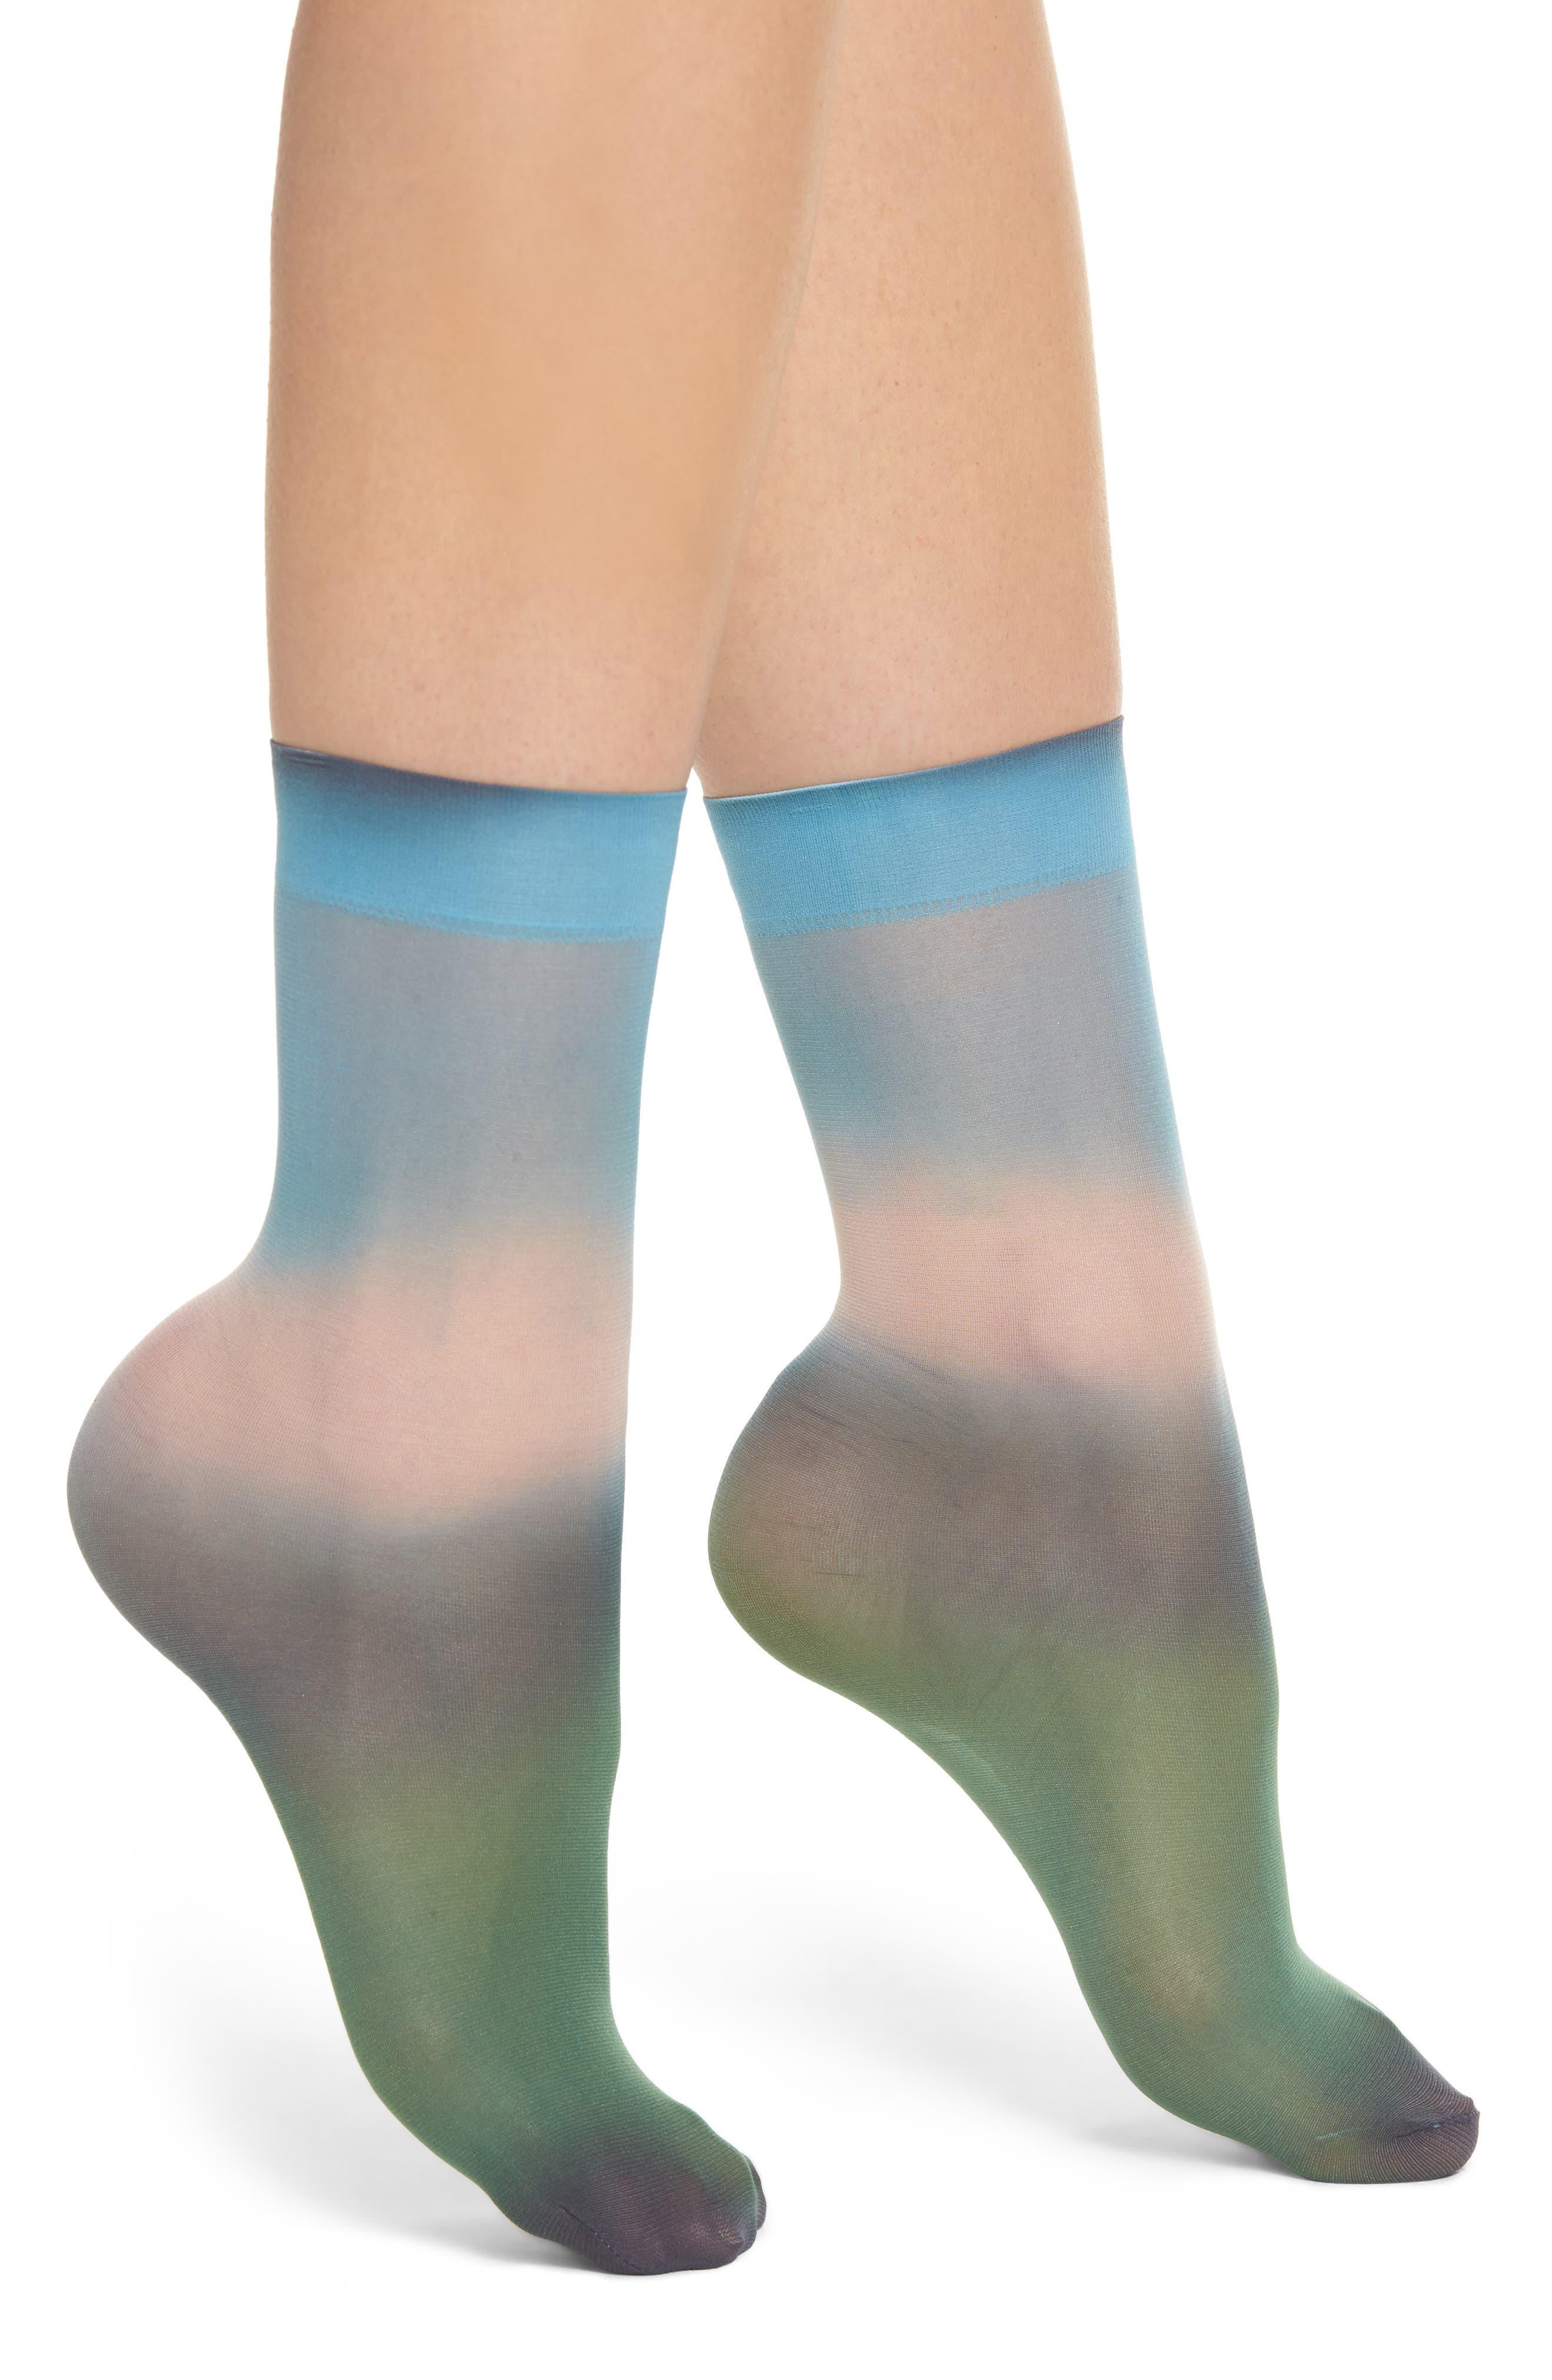 Hysteria by Happy Socks Mia Dip Dye Socks